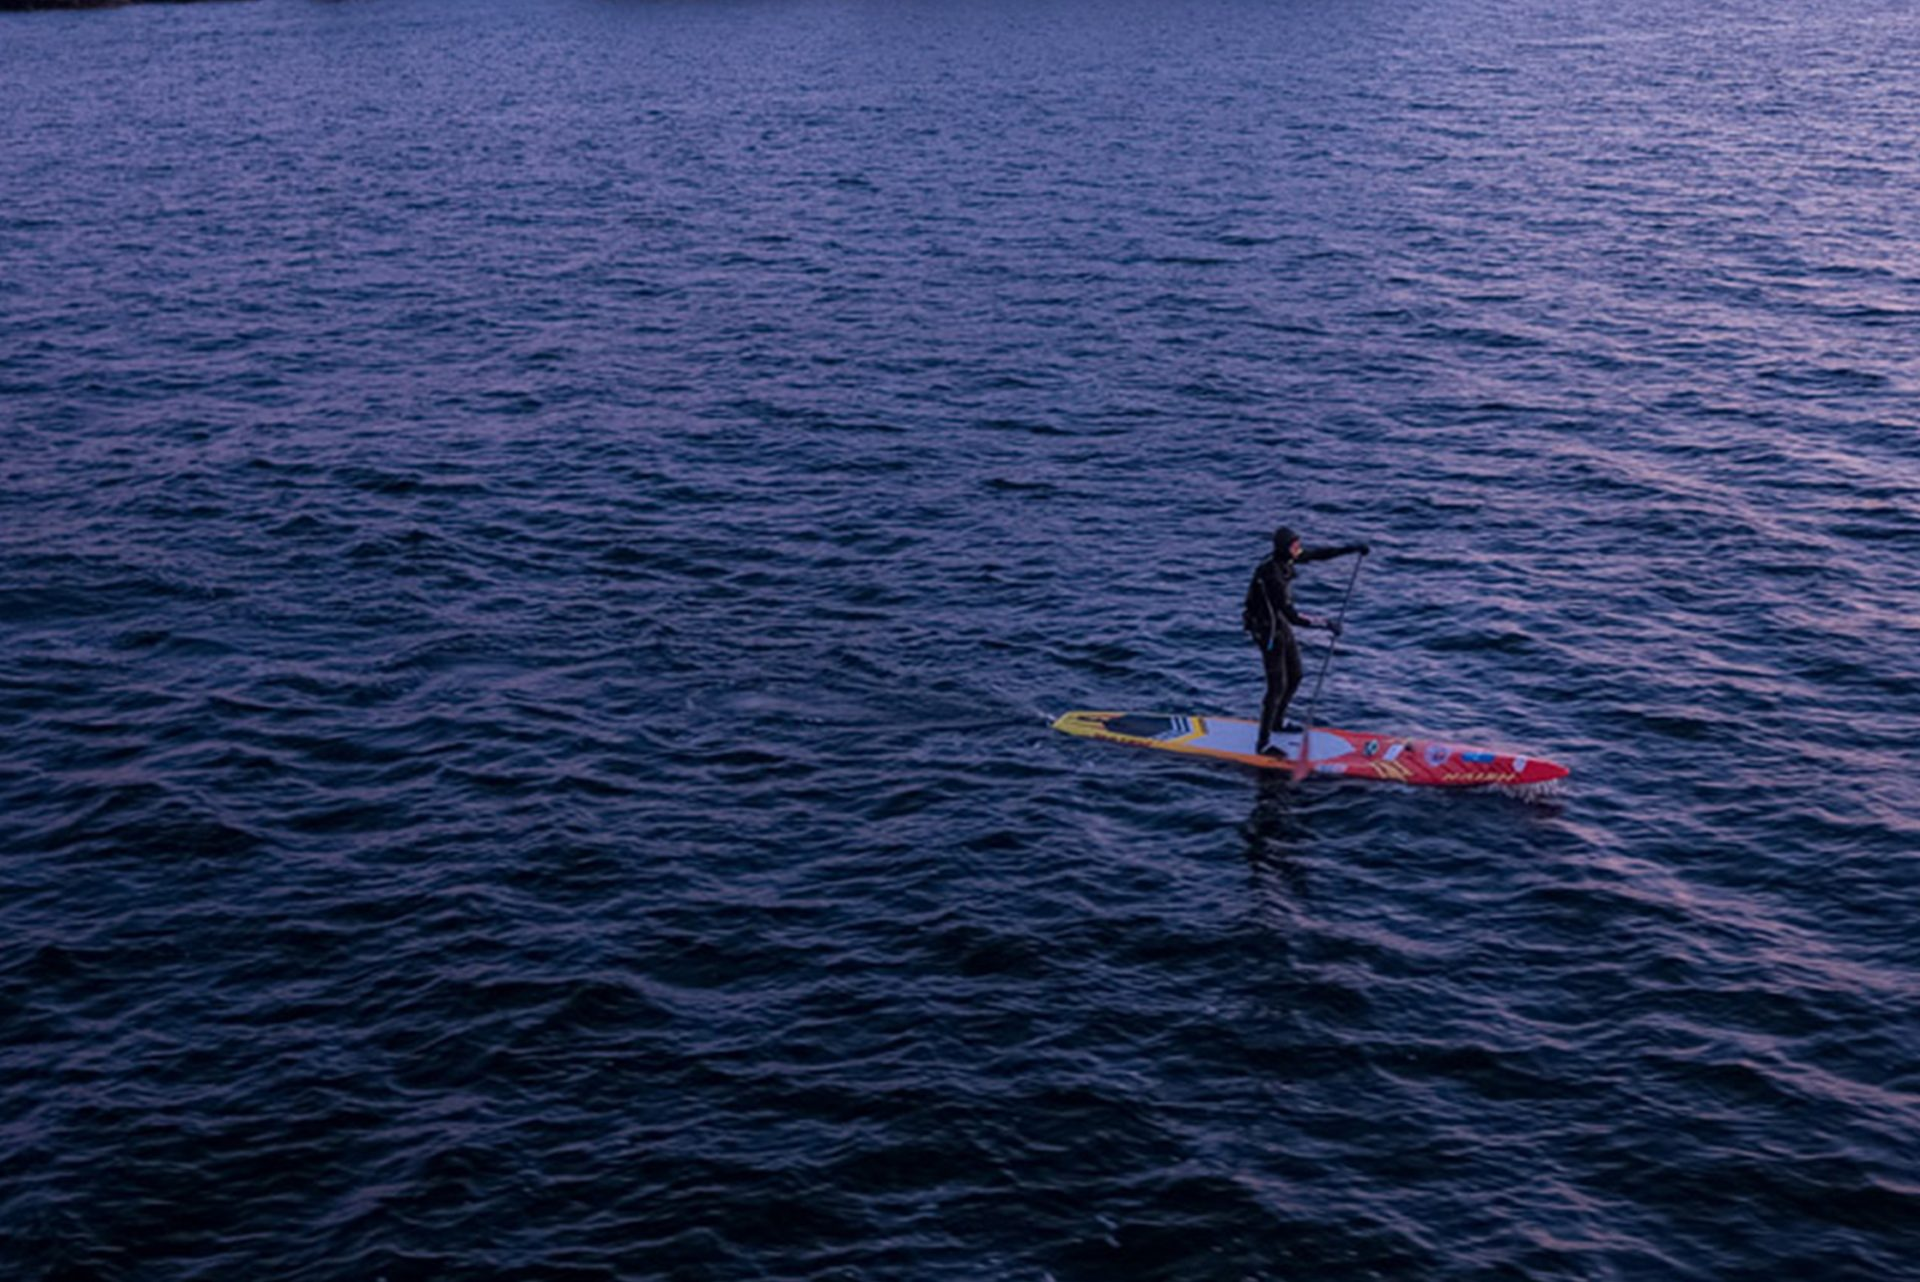 Casper Steinfath Paddleboards Skagerrak Ocean